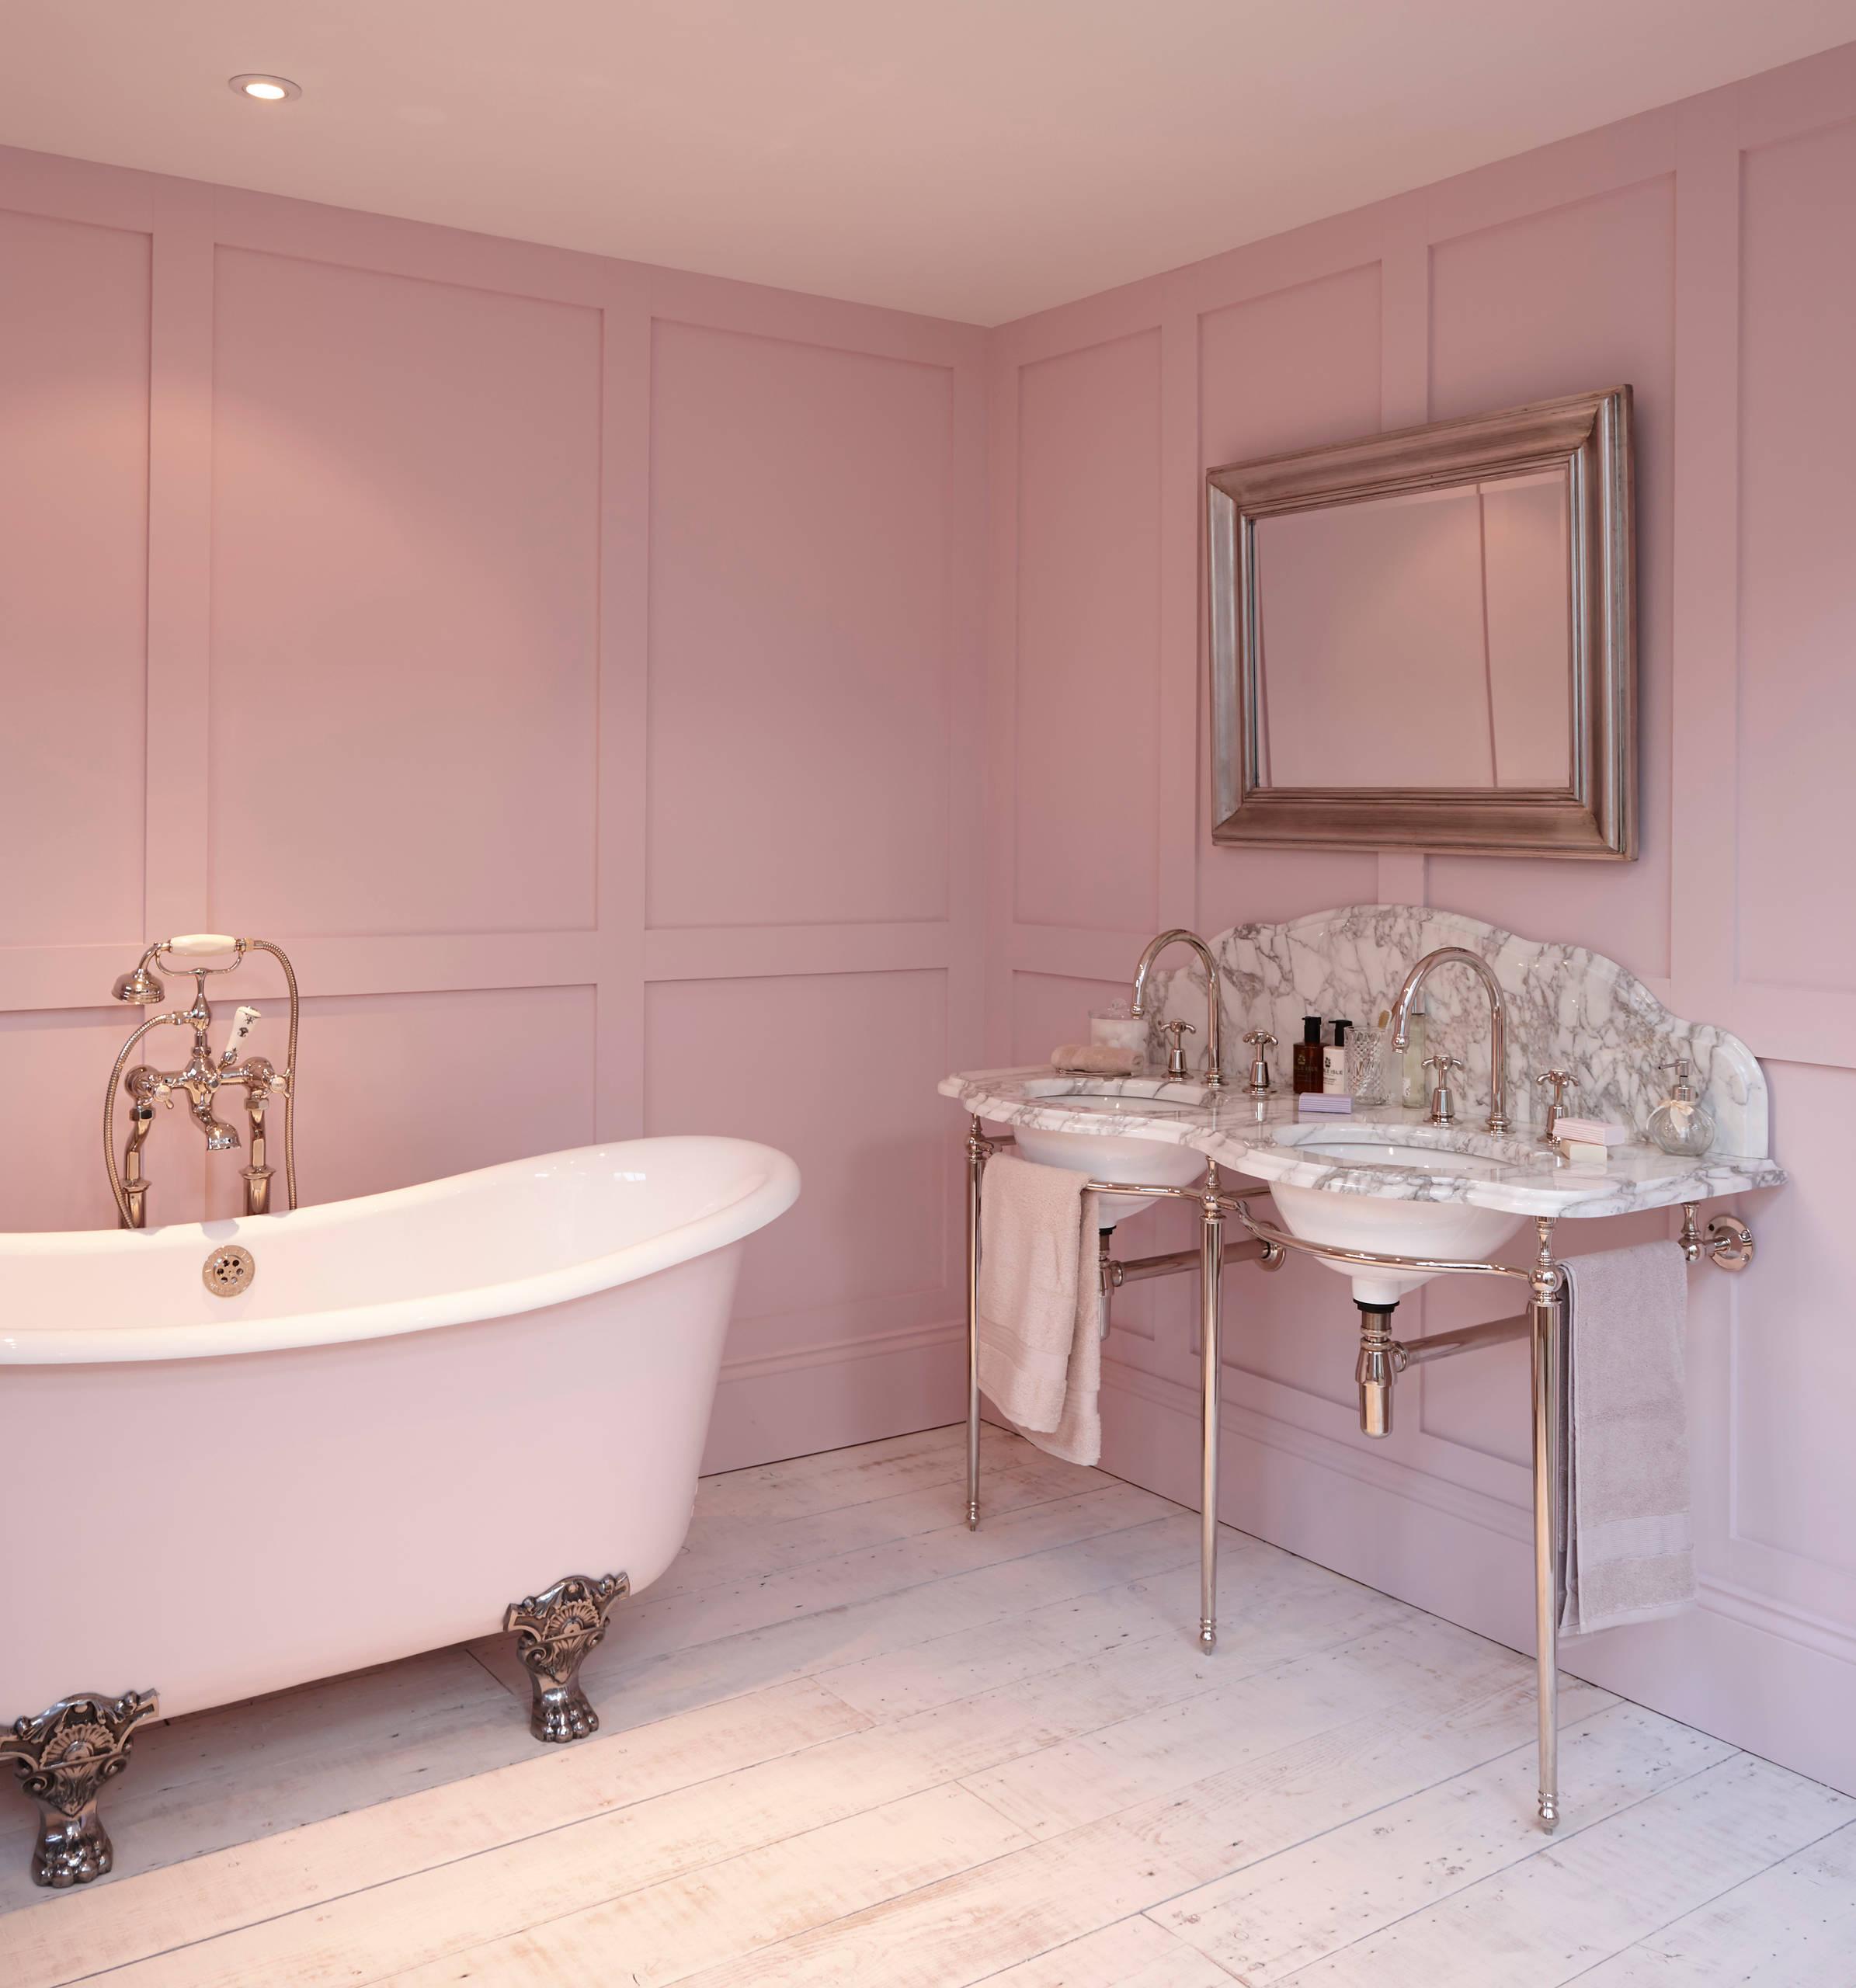 Salle De Bain Borgne 75 beautiful red matchstick tile bathroom pictures & ideas